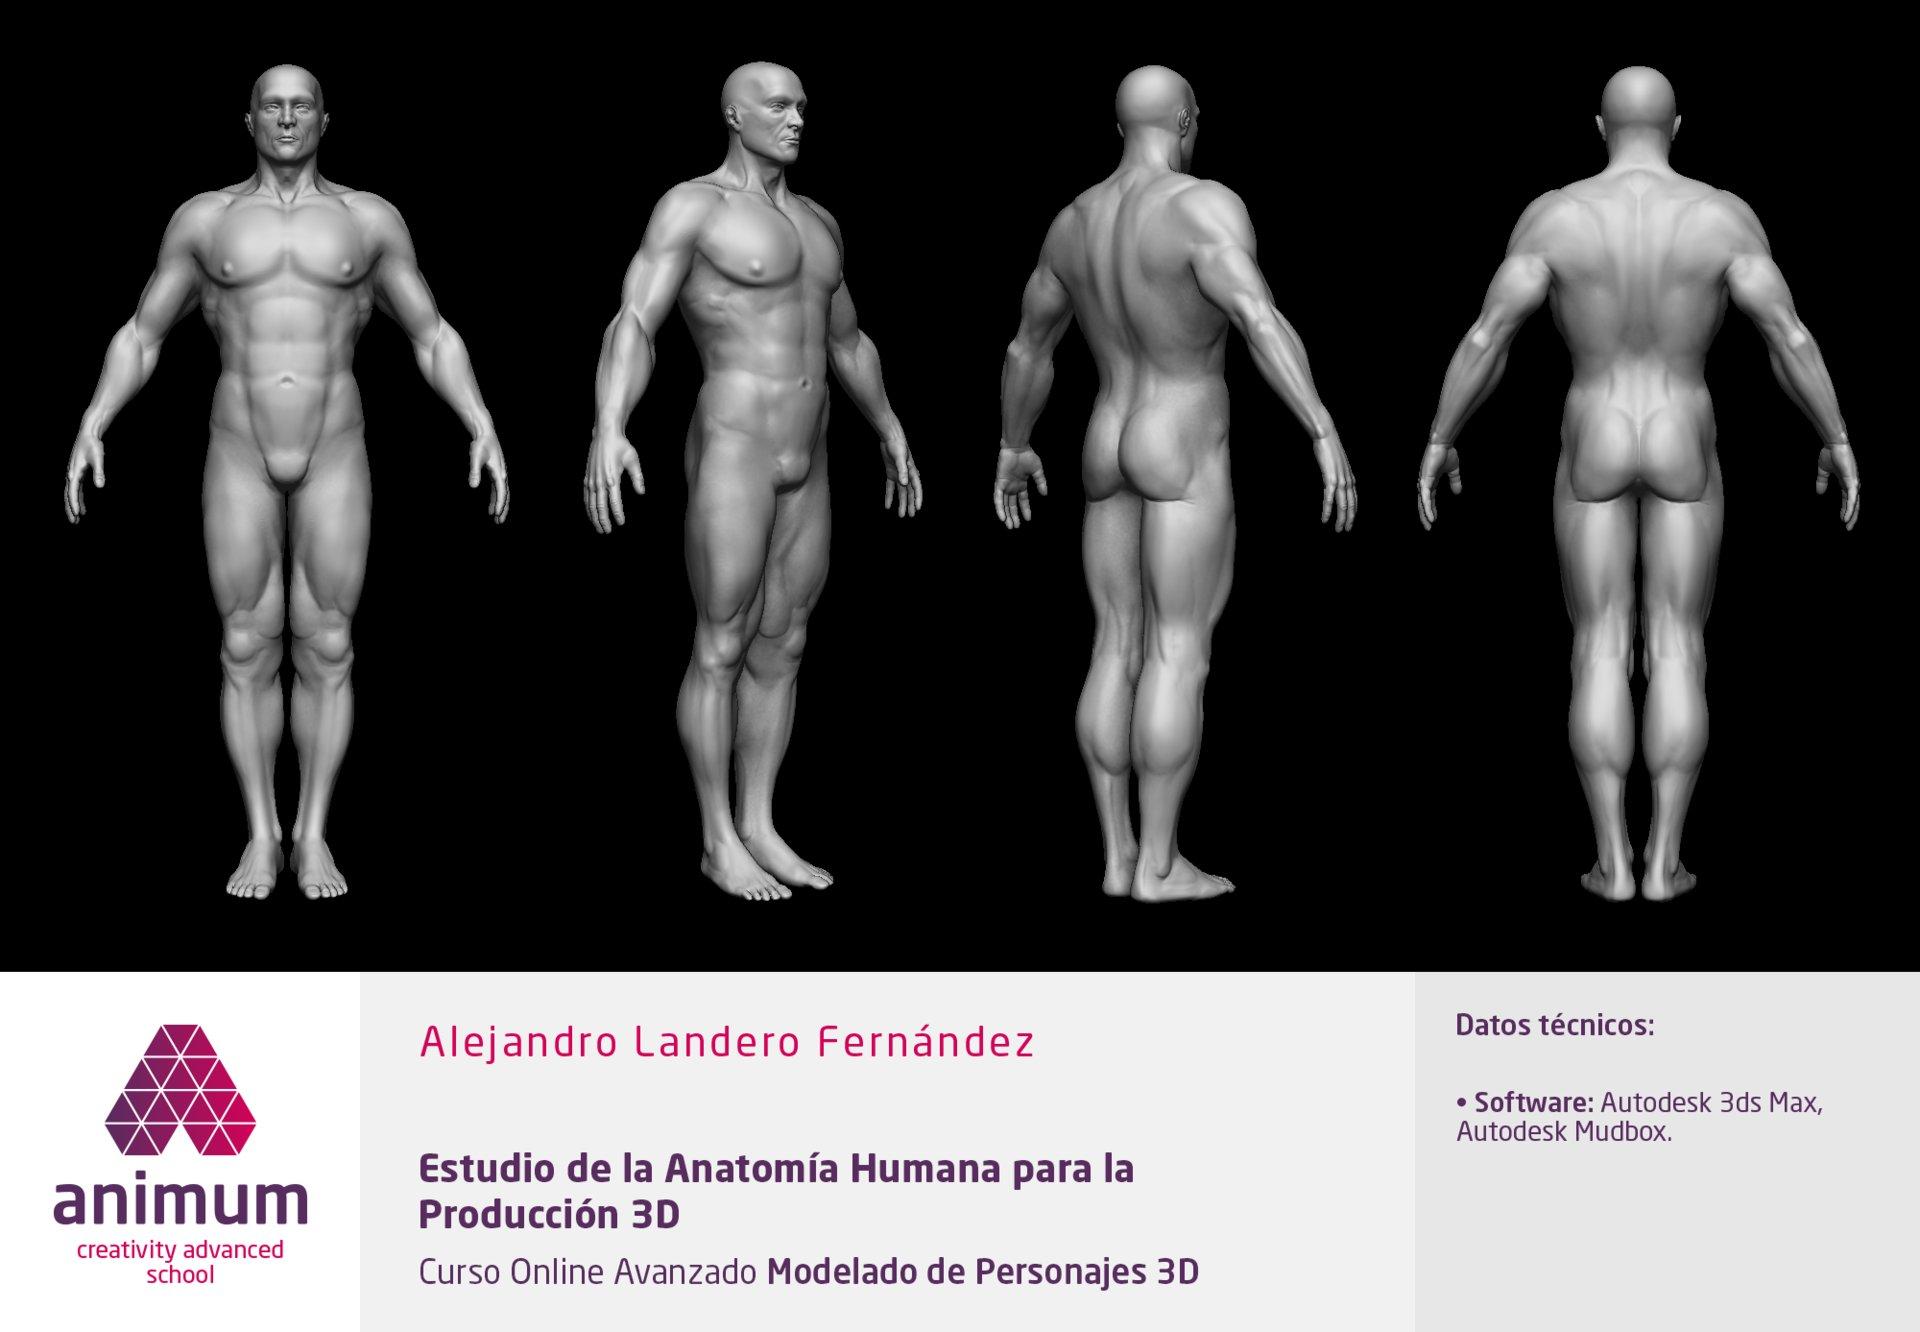 ArtStation - ANIMUM - CREATIVITY ADVANCED SCHOOL, Alejandro Landero